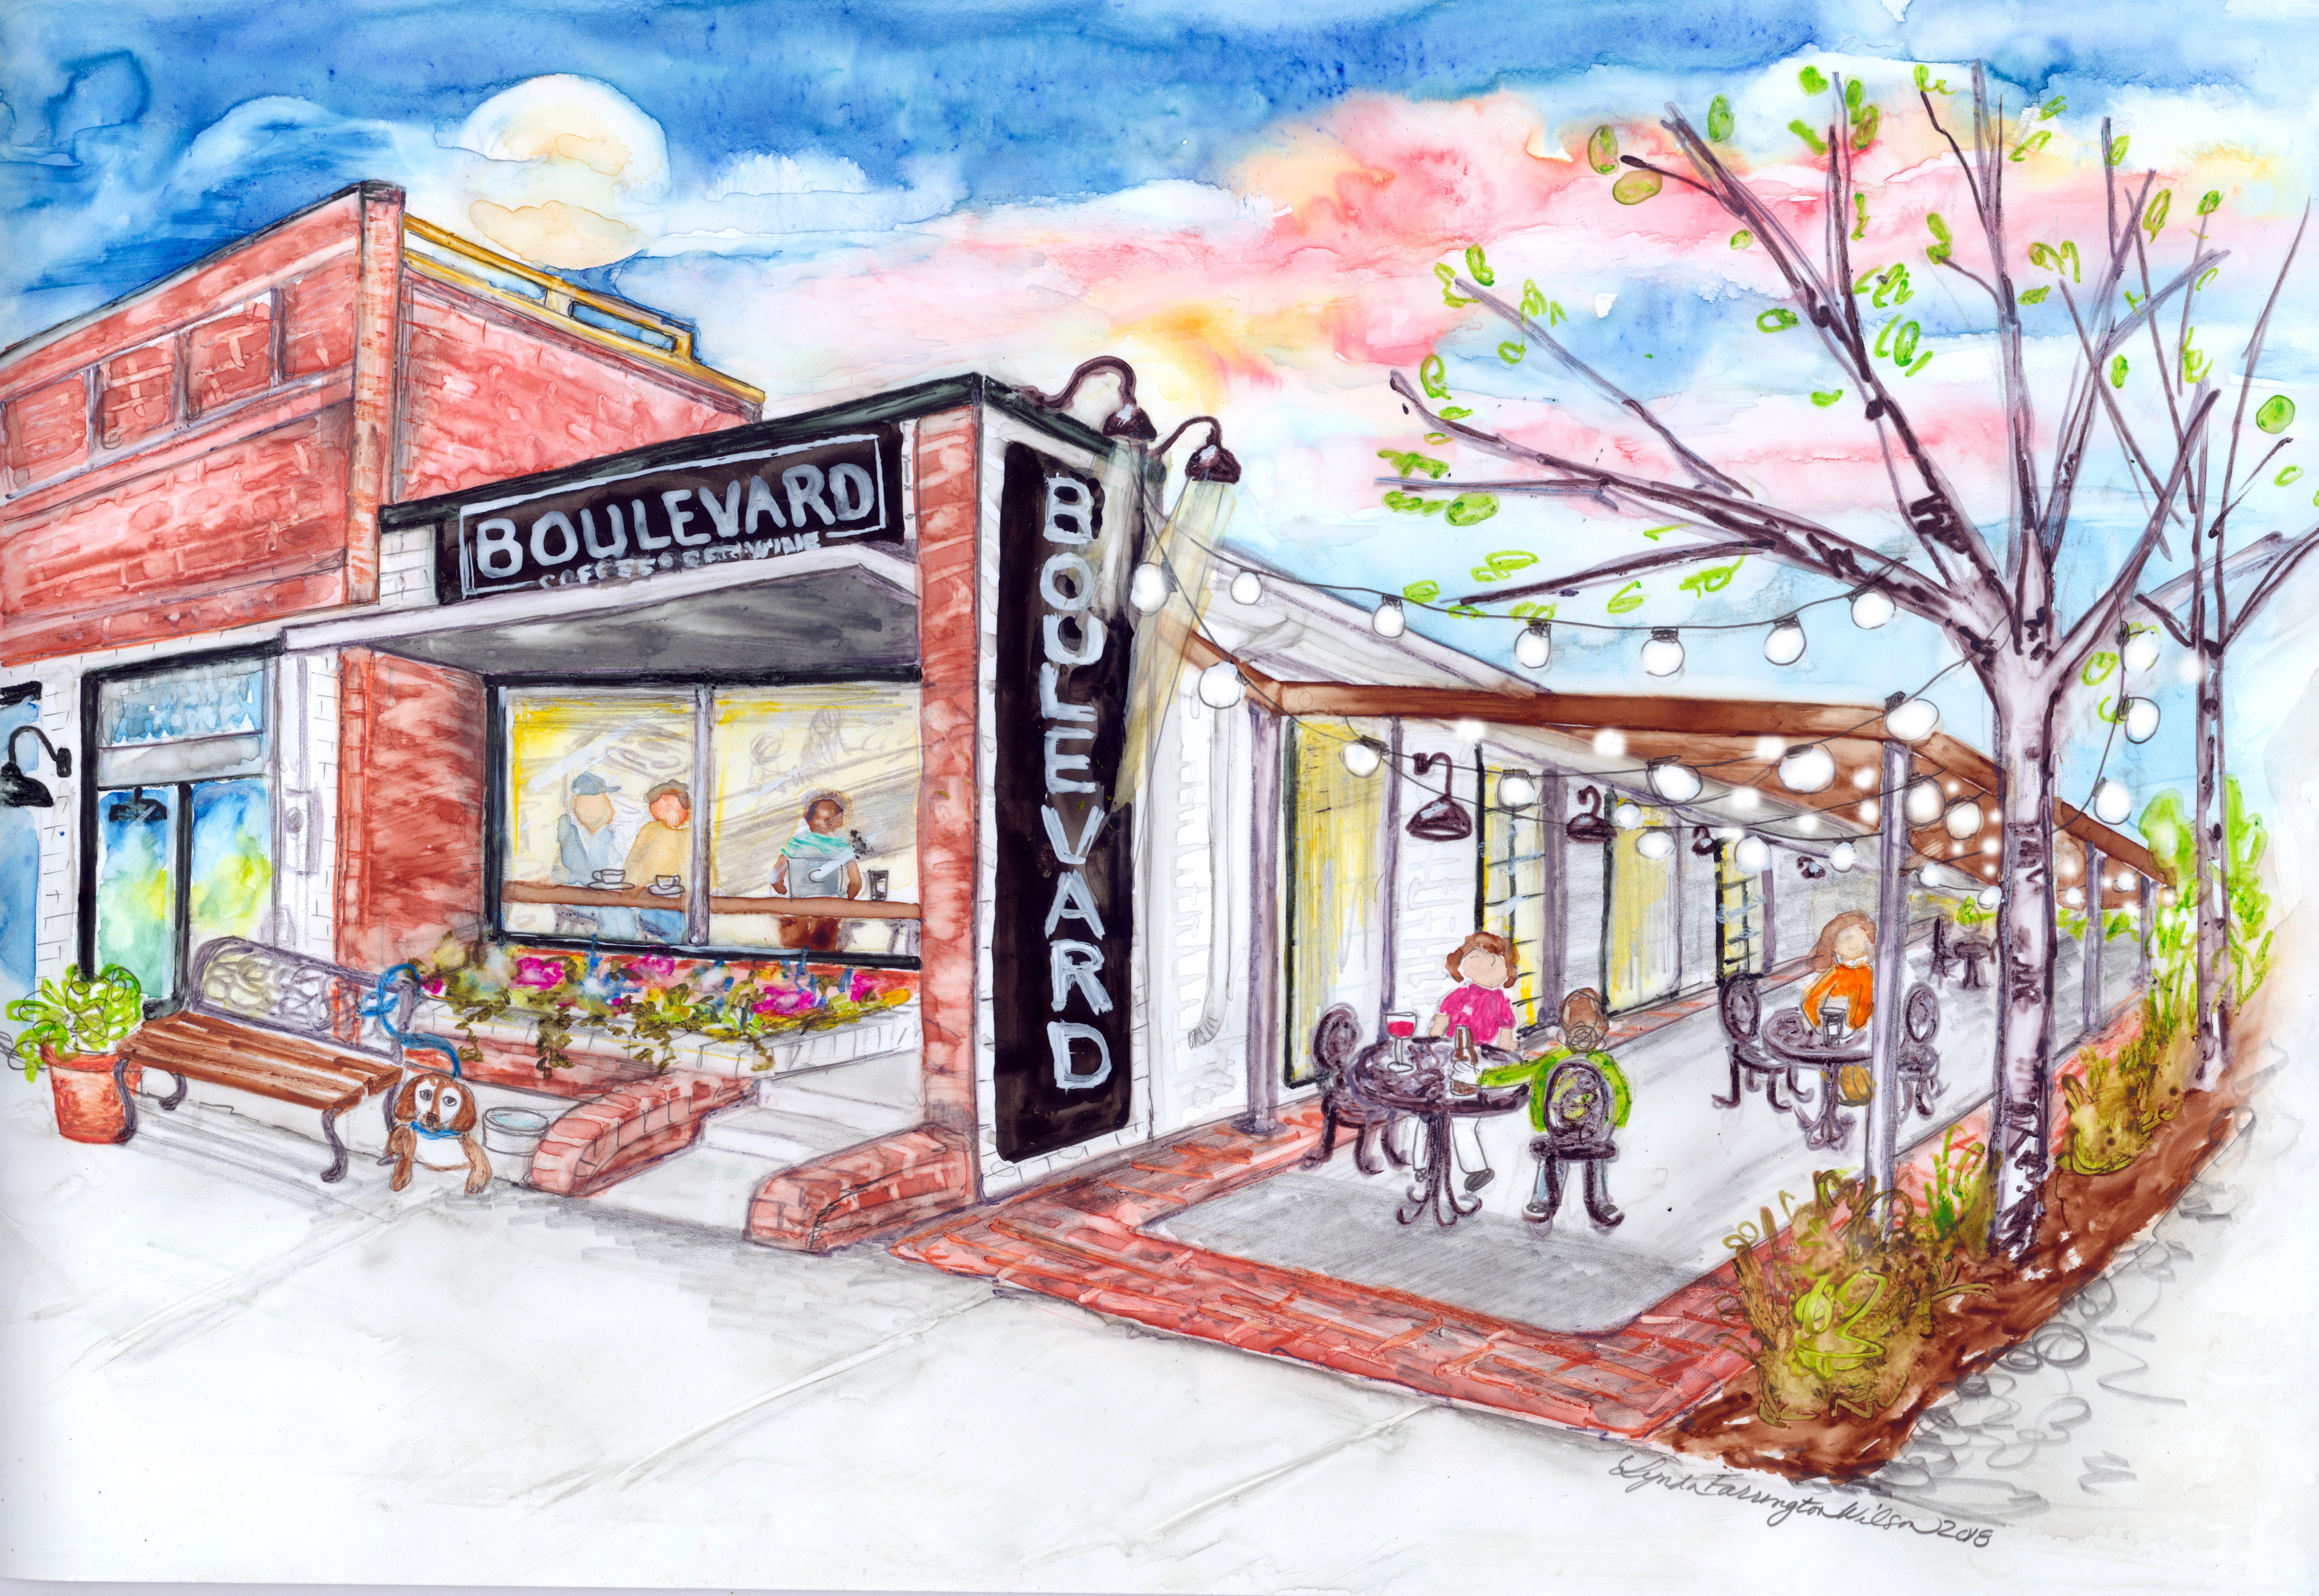 BoulevardIllustration